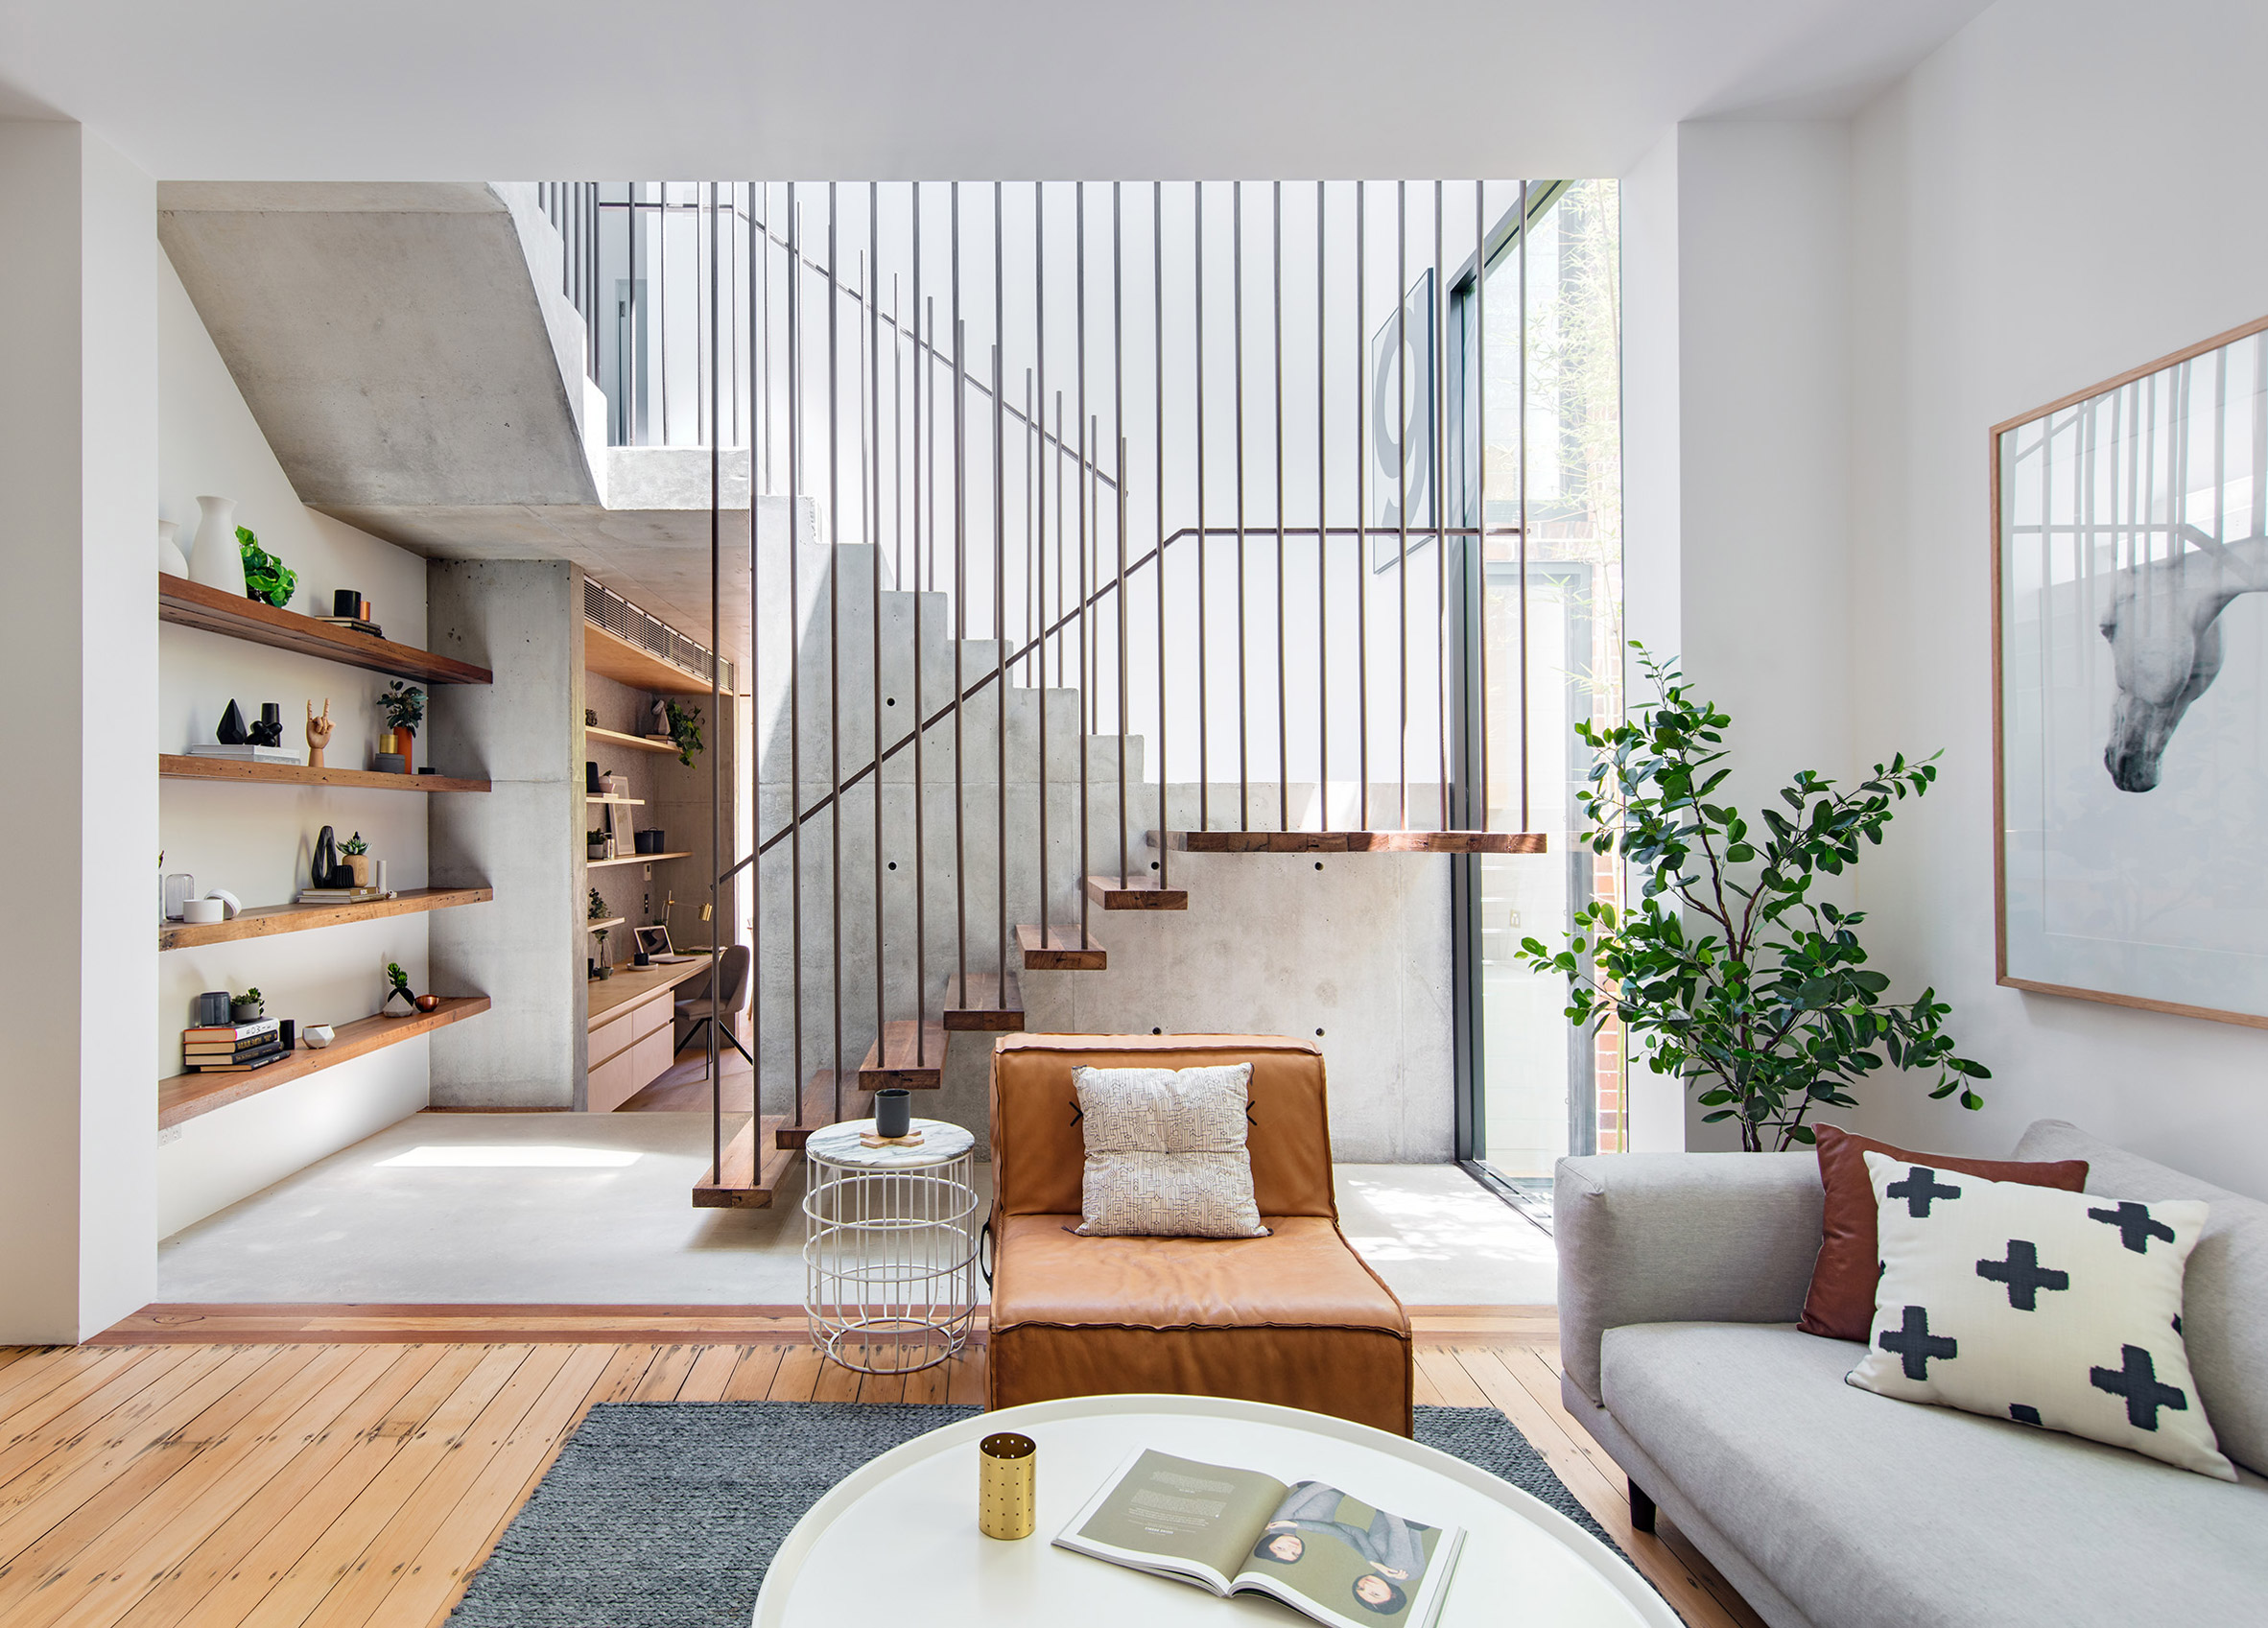 Best Mr Price Home Design Quarter Gallery - Decoration Design Ideas ...